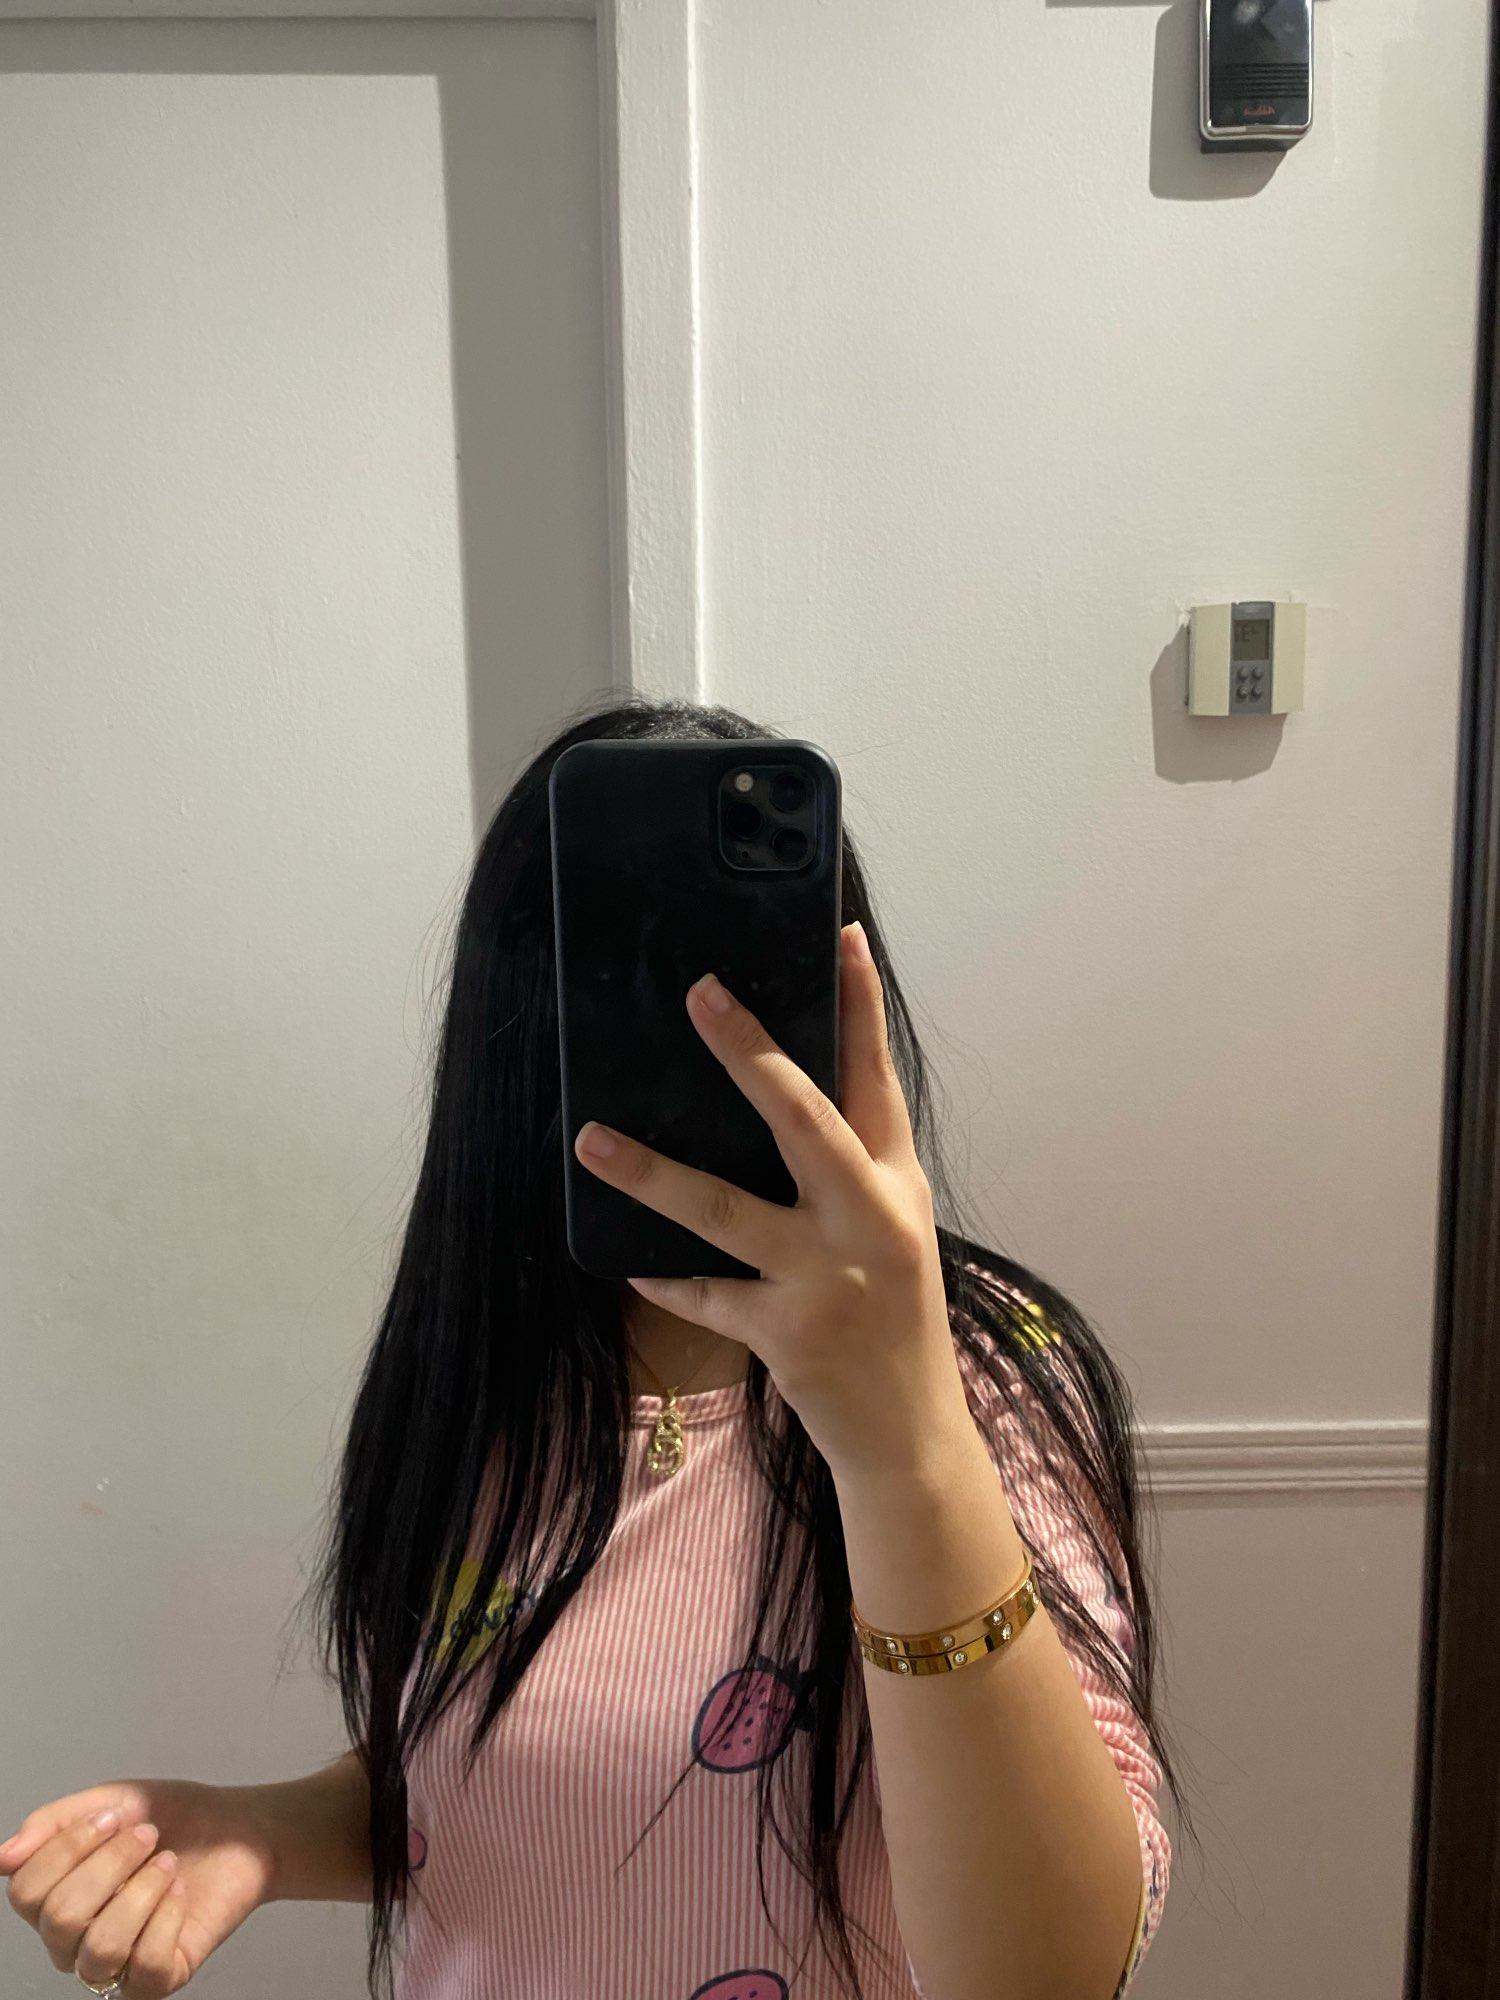 Professional 110 220V Hair Curling Iron Ceramic Triple Barrel CeramicHair Curler Hair Waver Styling Tools Hair Styler Tool|hair styler|hair wavertriple barrel hair curler - AliExpress